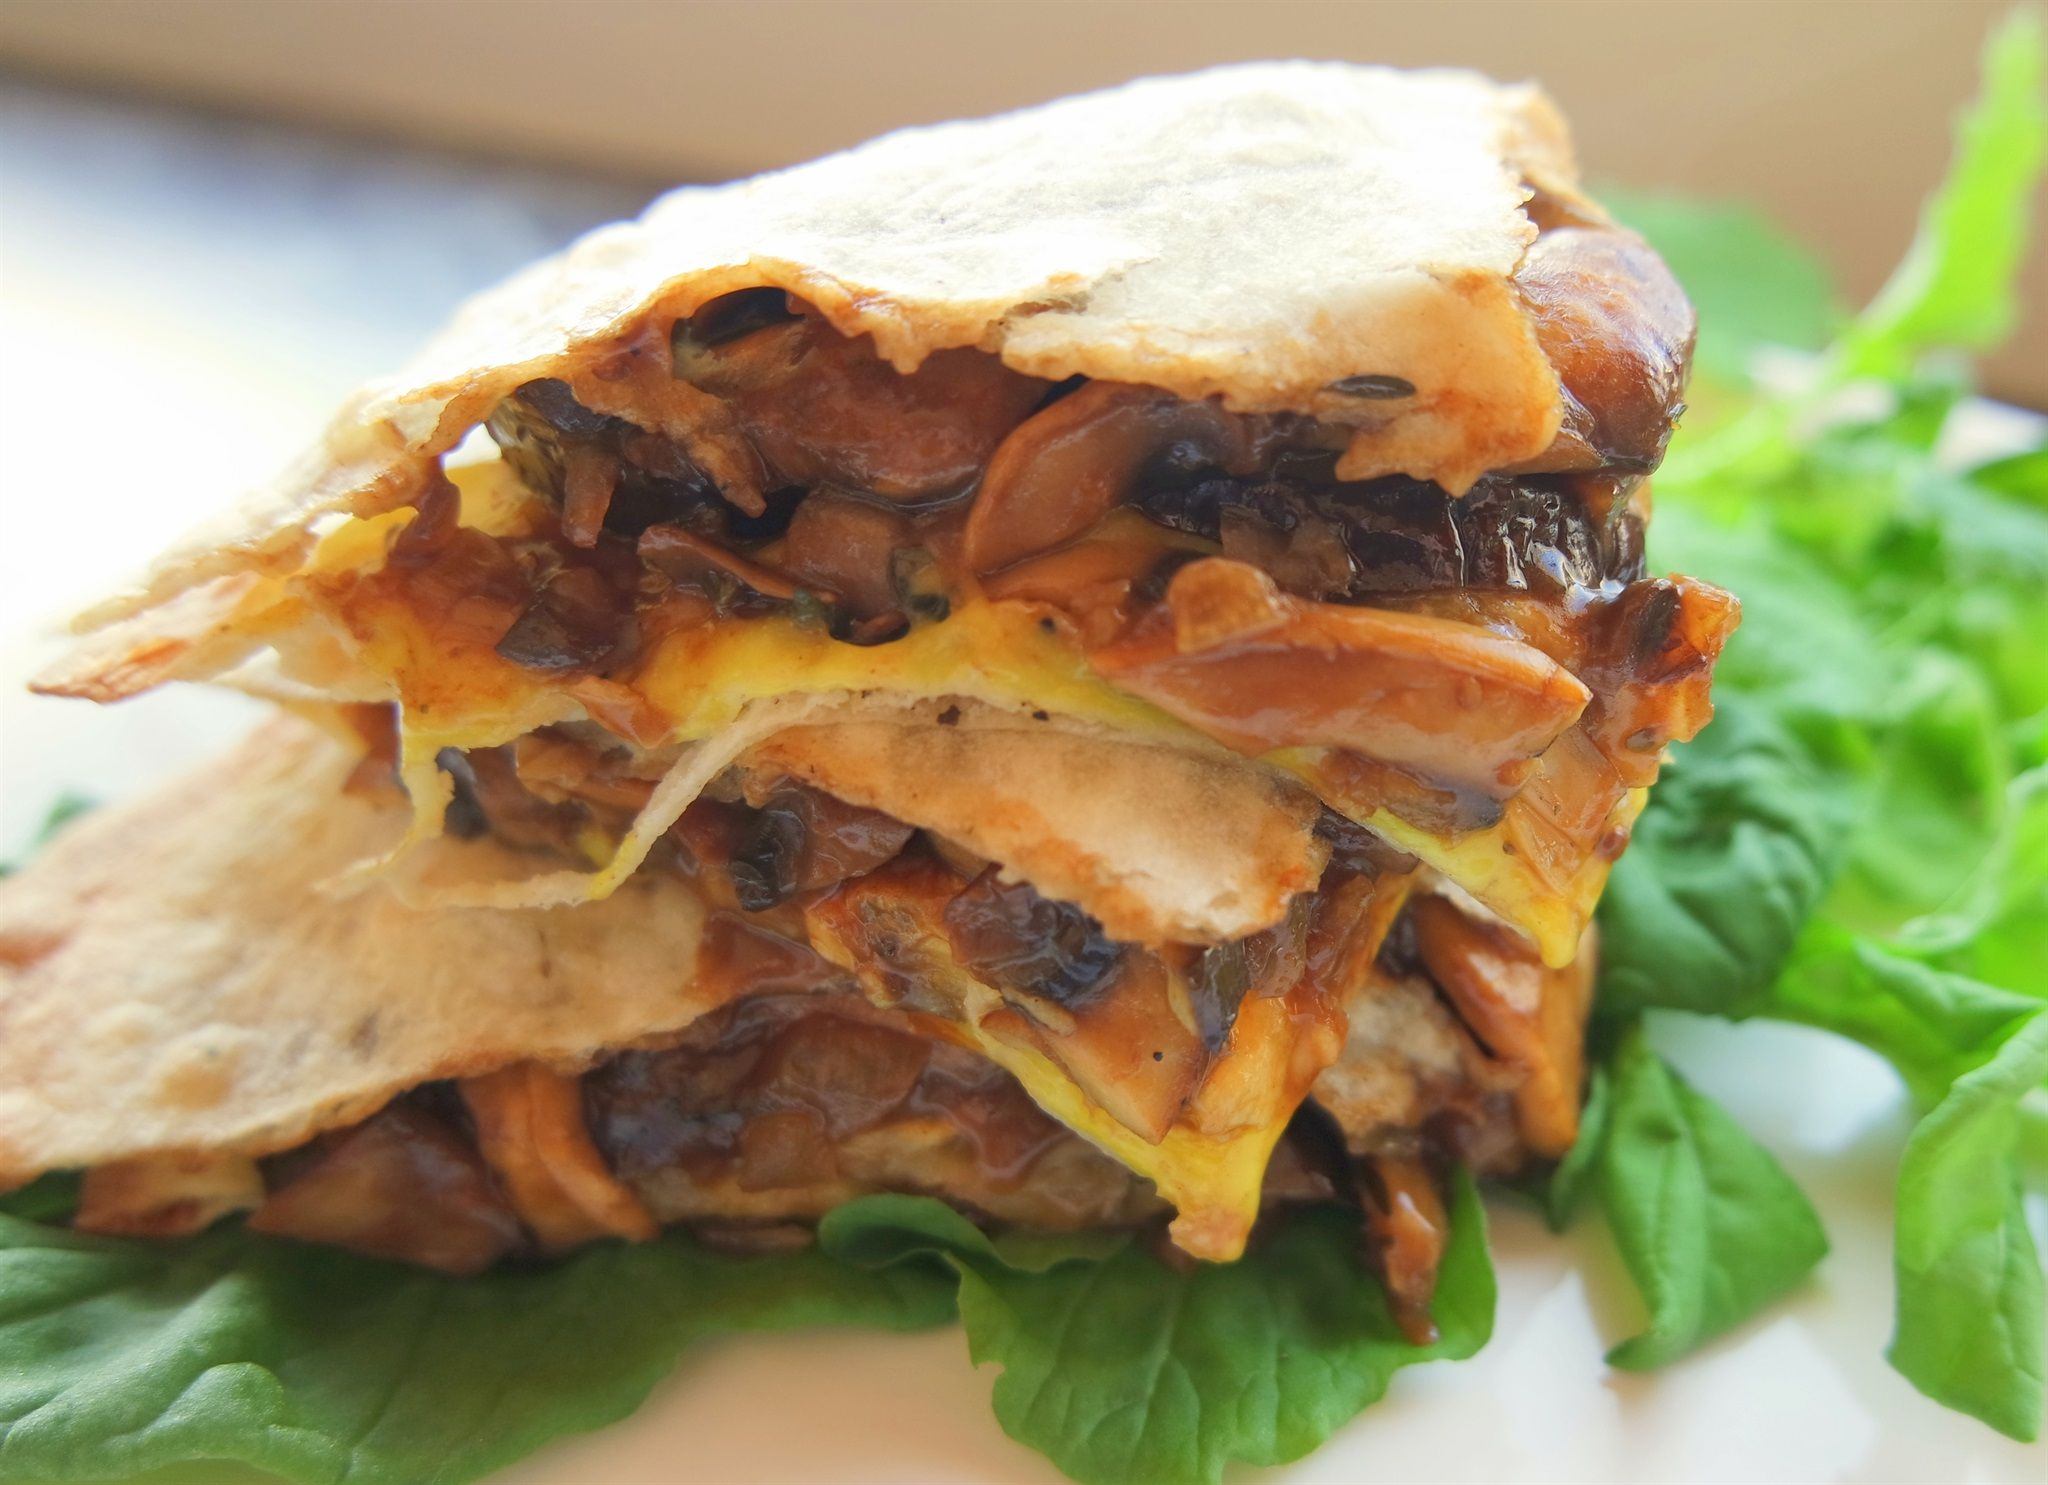 #greenmondaysa: Cheesy Quesadillas With Eggplant And Mushroom Filling photo